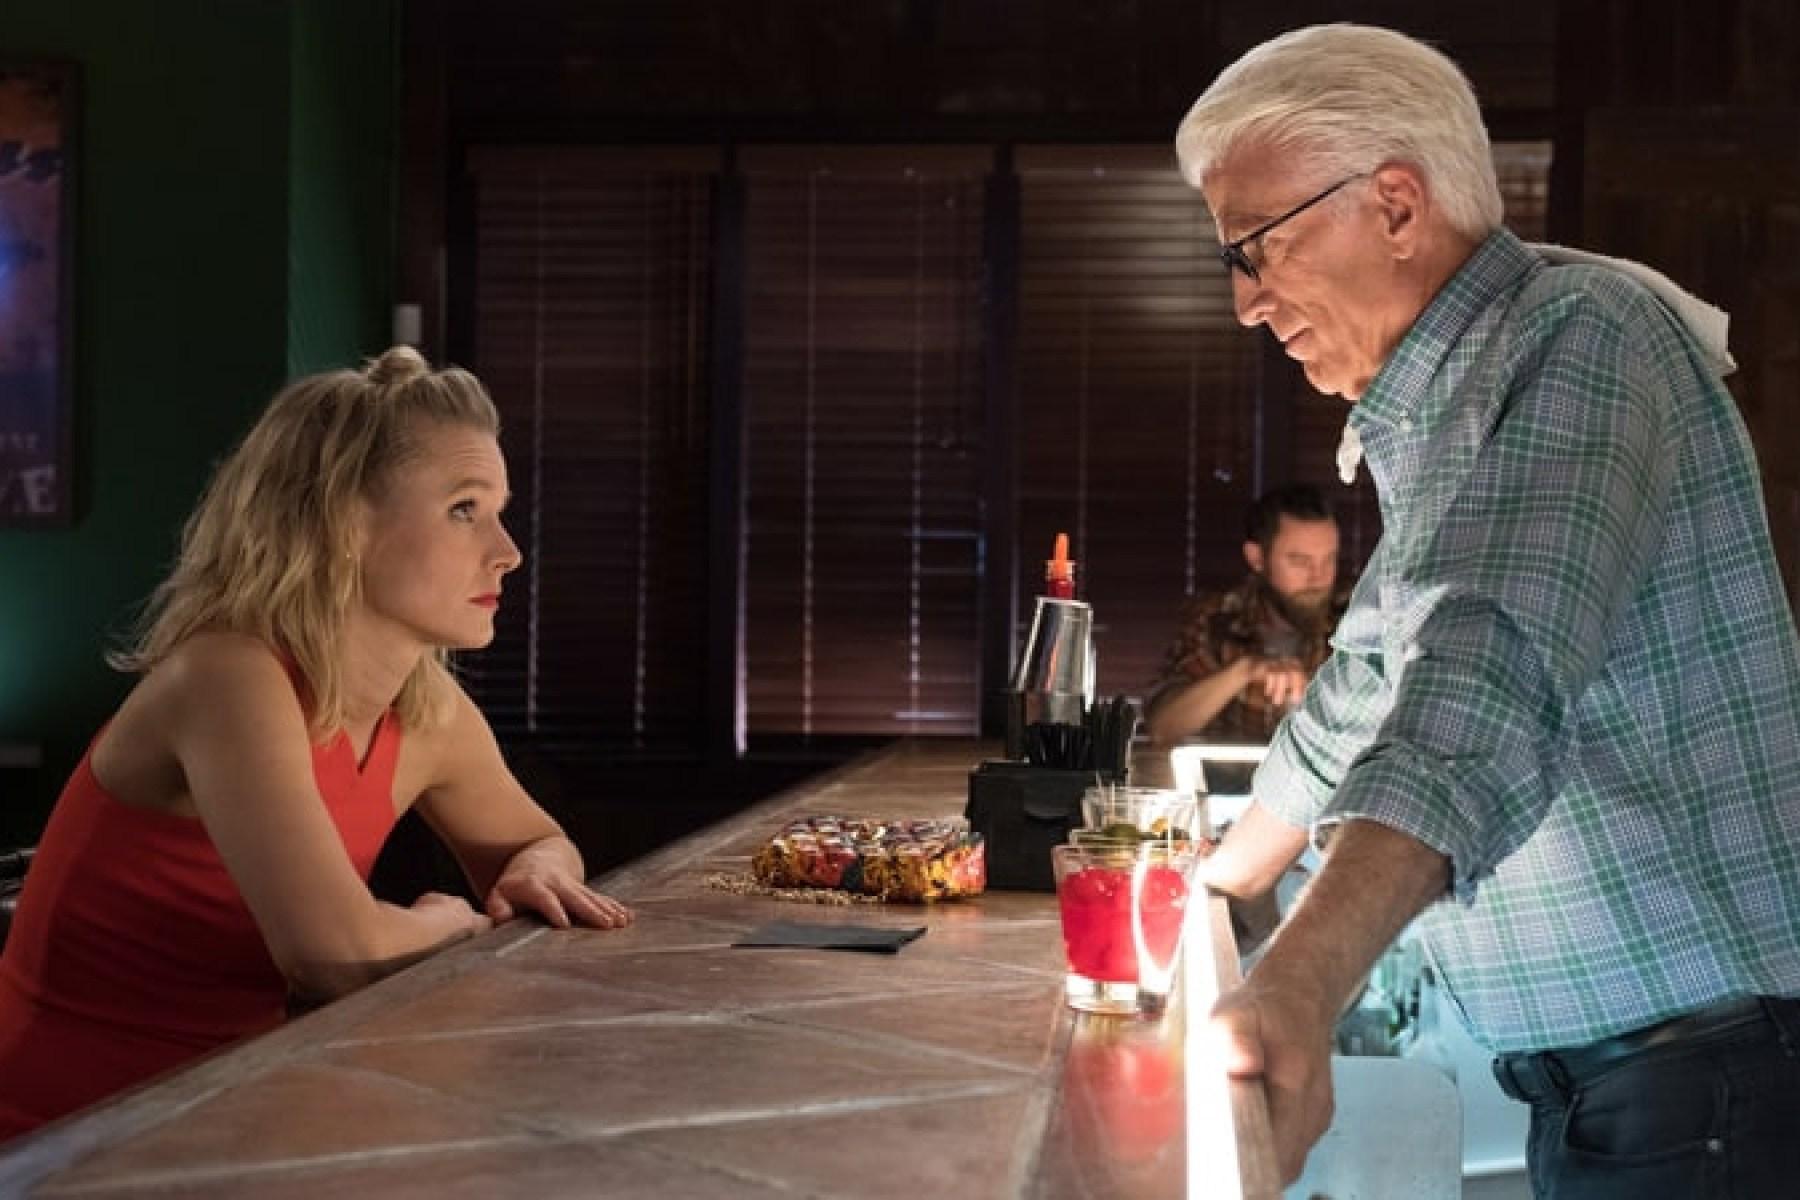 The Good Place' Creator Mike Schur Breaks Down Season 2 - Rolling Stone